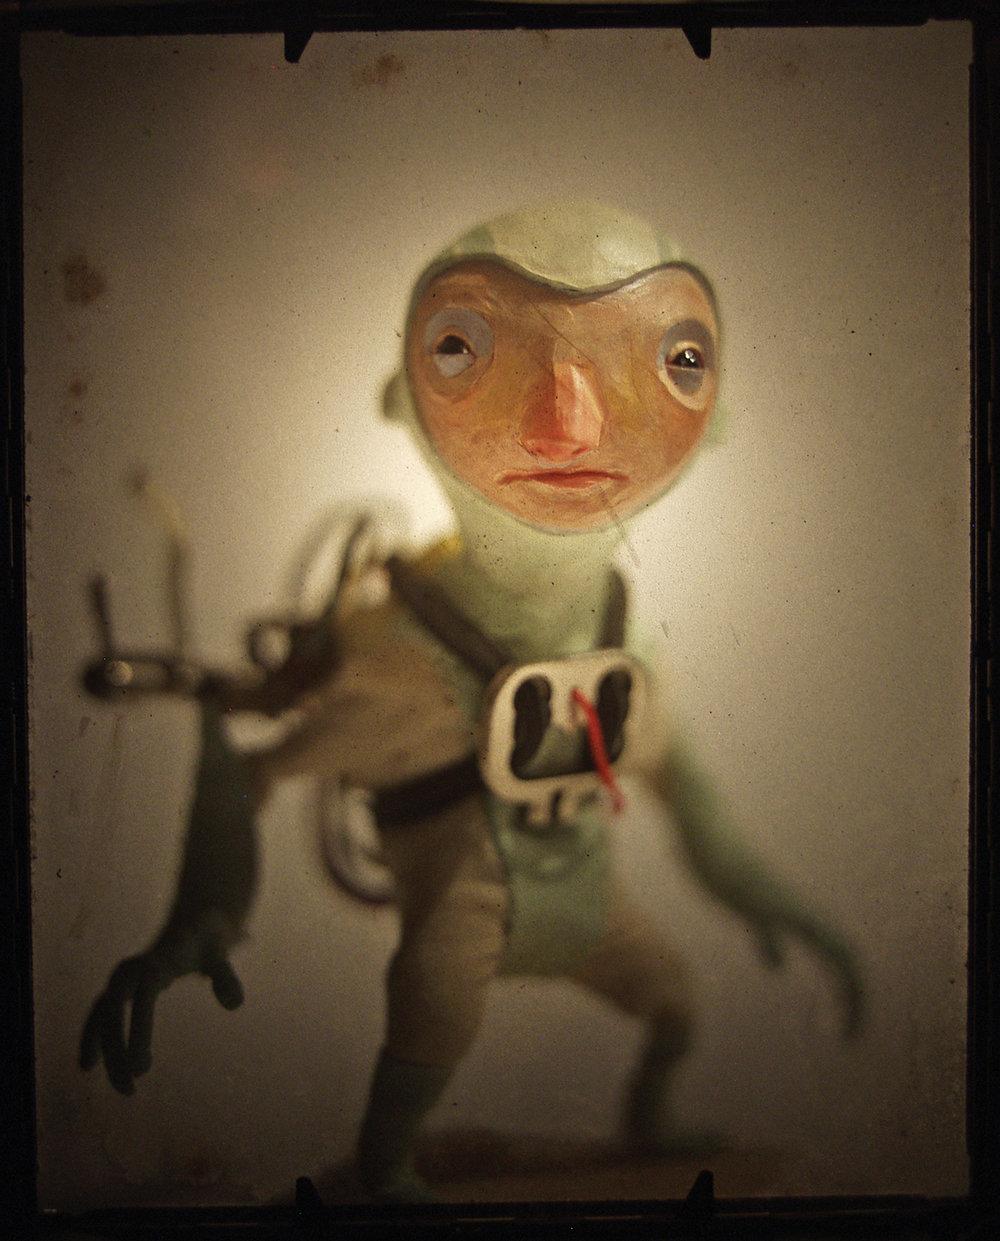 3x3 no.5 2008 - ARTIST: Red Nose StudioTITLE: Elemi